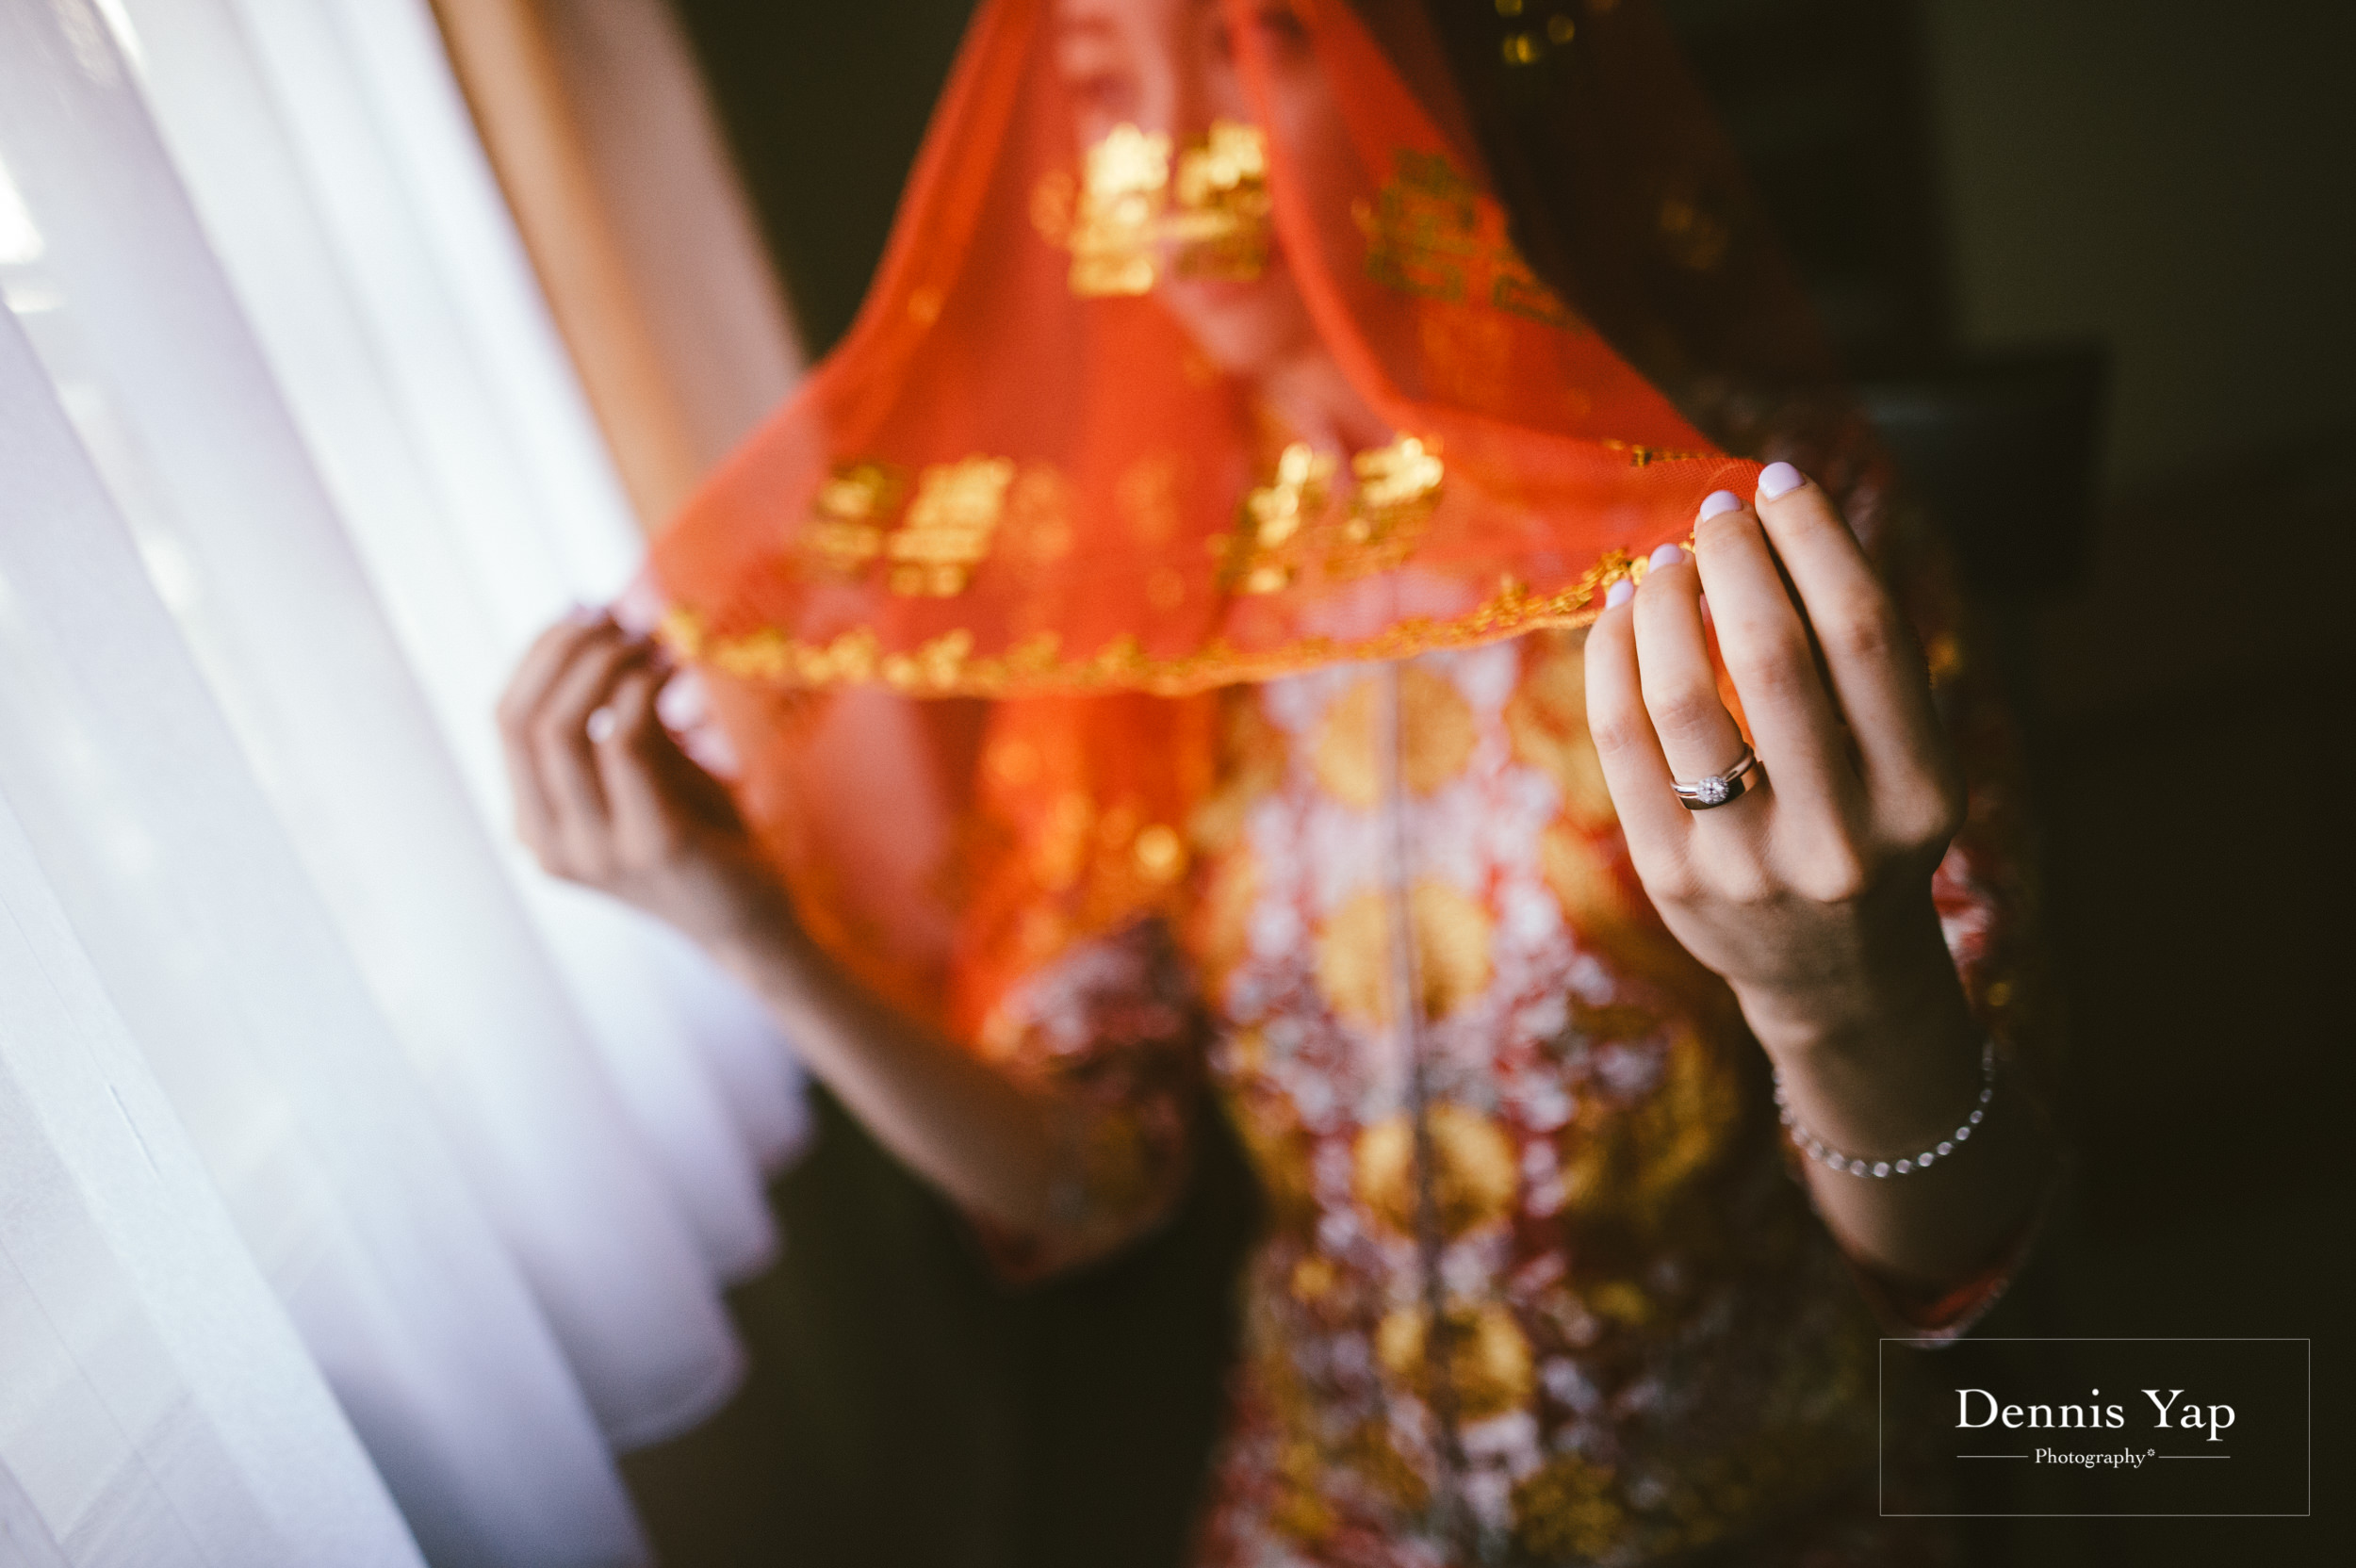 justin hsin wedding day ciao ristorante kuala lumpur dennis yap photography-10.jpg